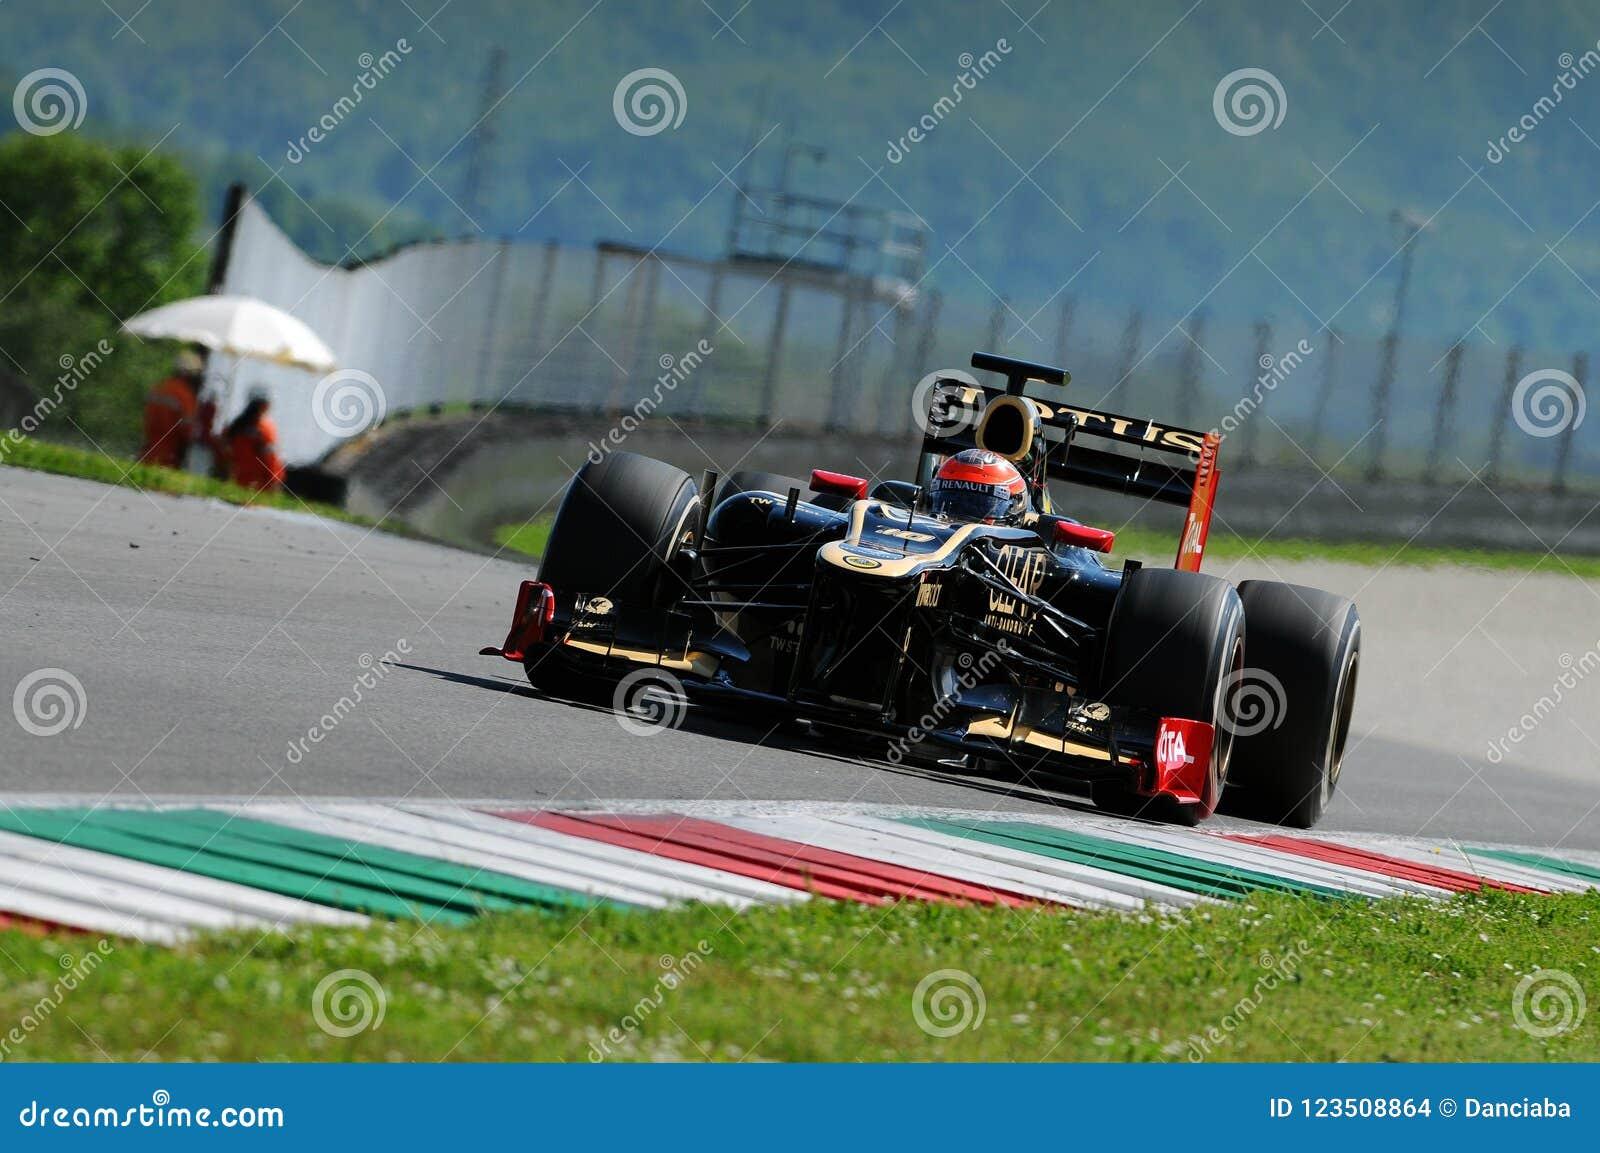 MUGELLO, ITALIE - MAI 2012 : Romain Grosjean de Lotus Renault F1 conduit pendant la session d essai dans le circuit de Mugello, I